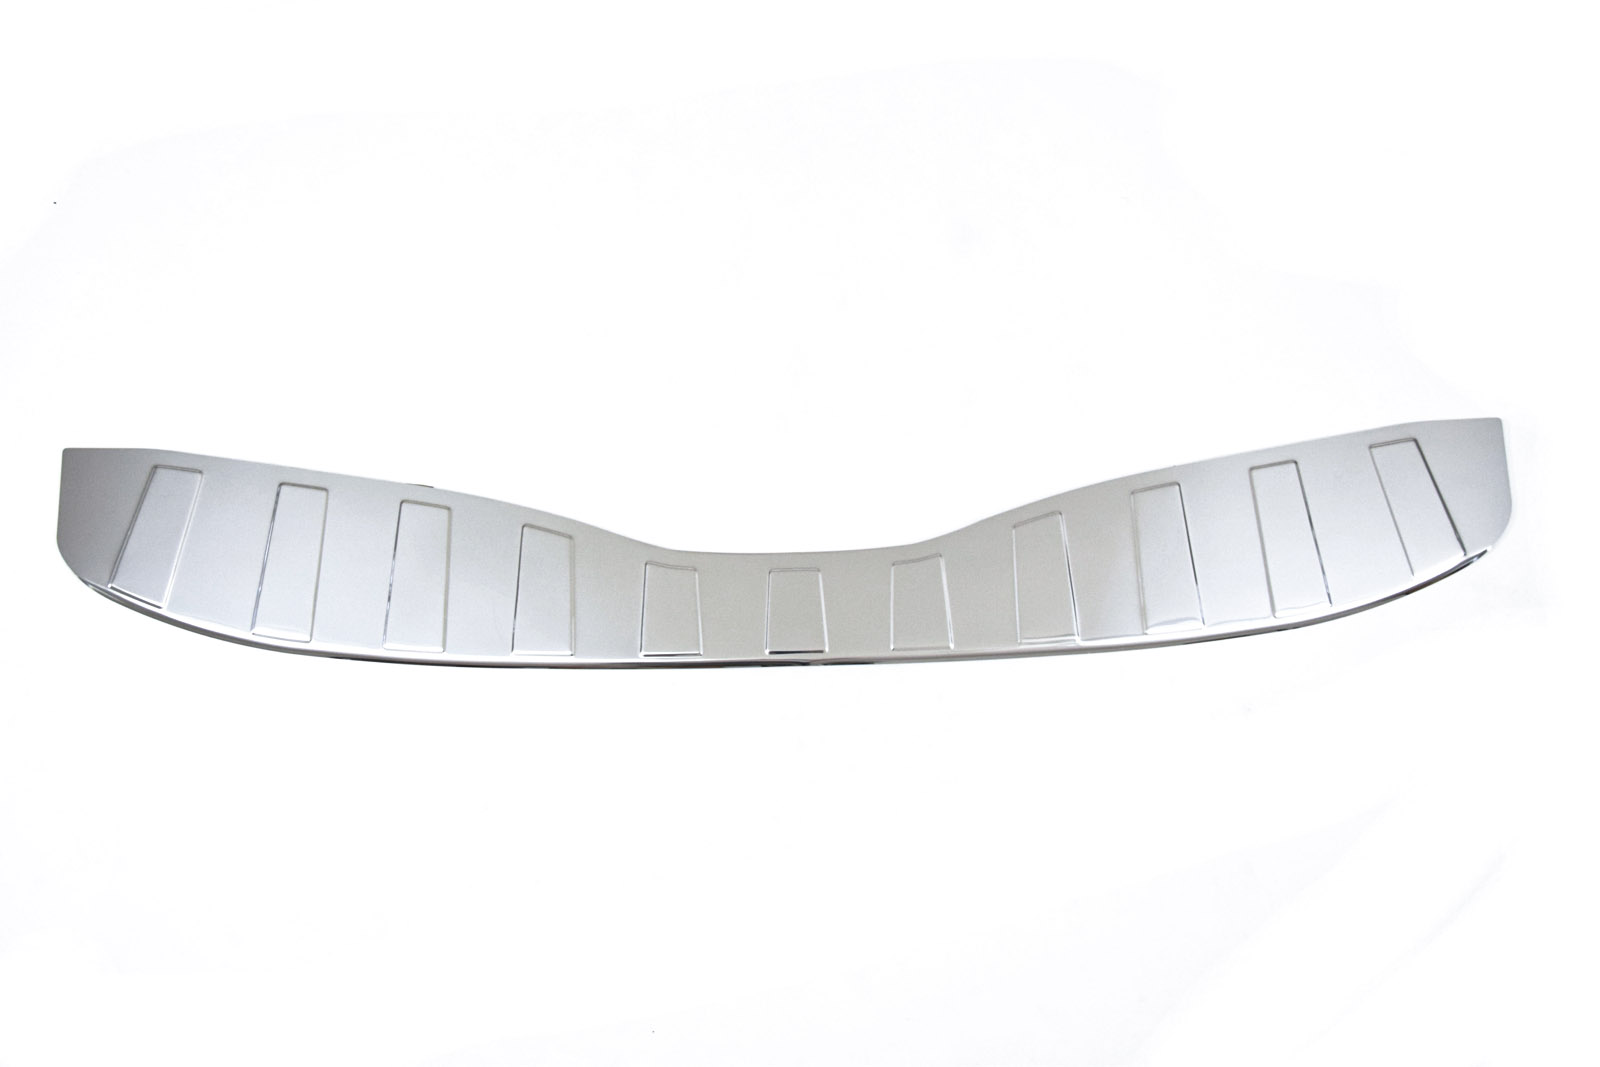 Nerezový kryt náraznika Ford Mondeo IV FL kombi 2010-2013